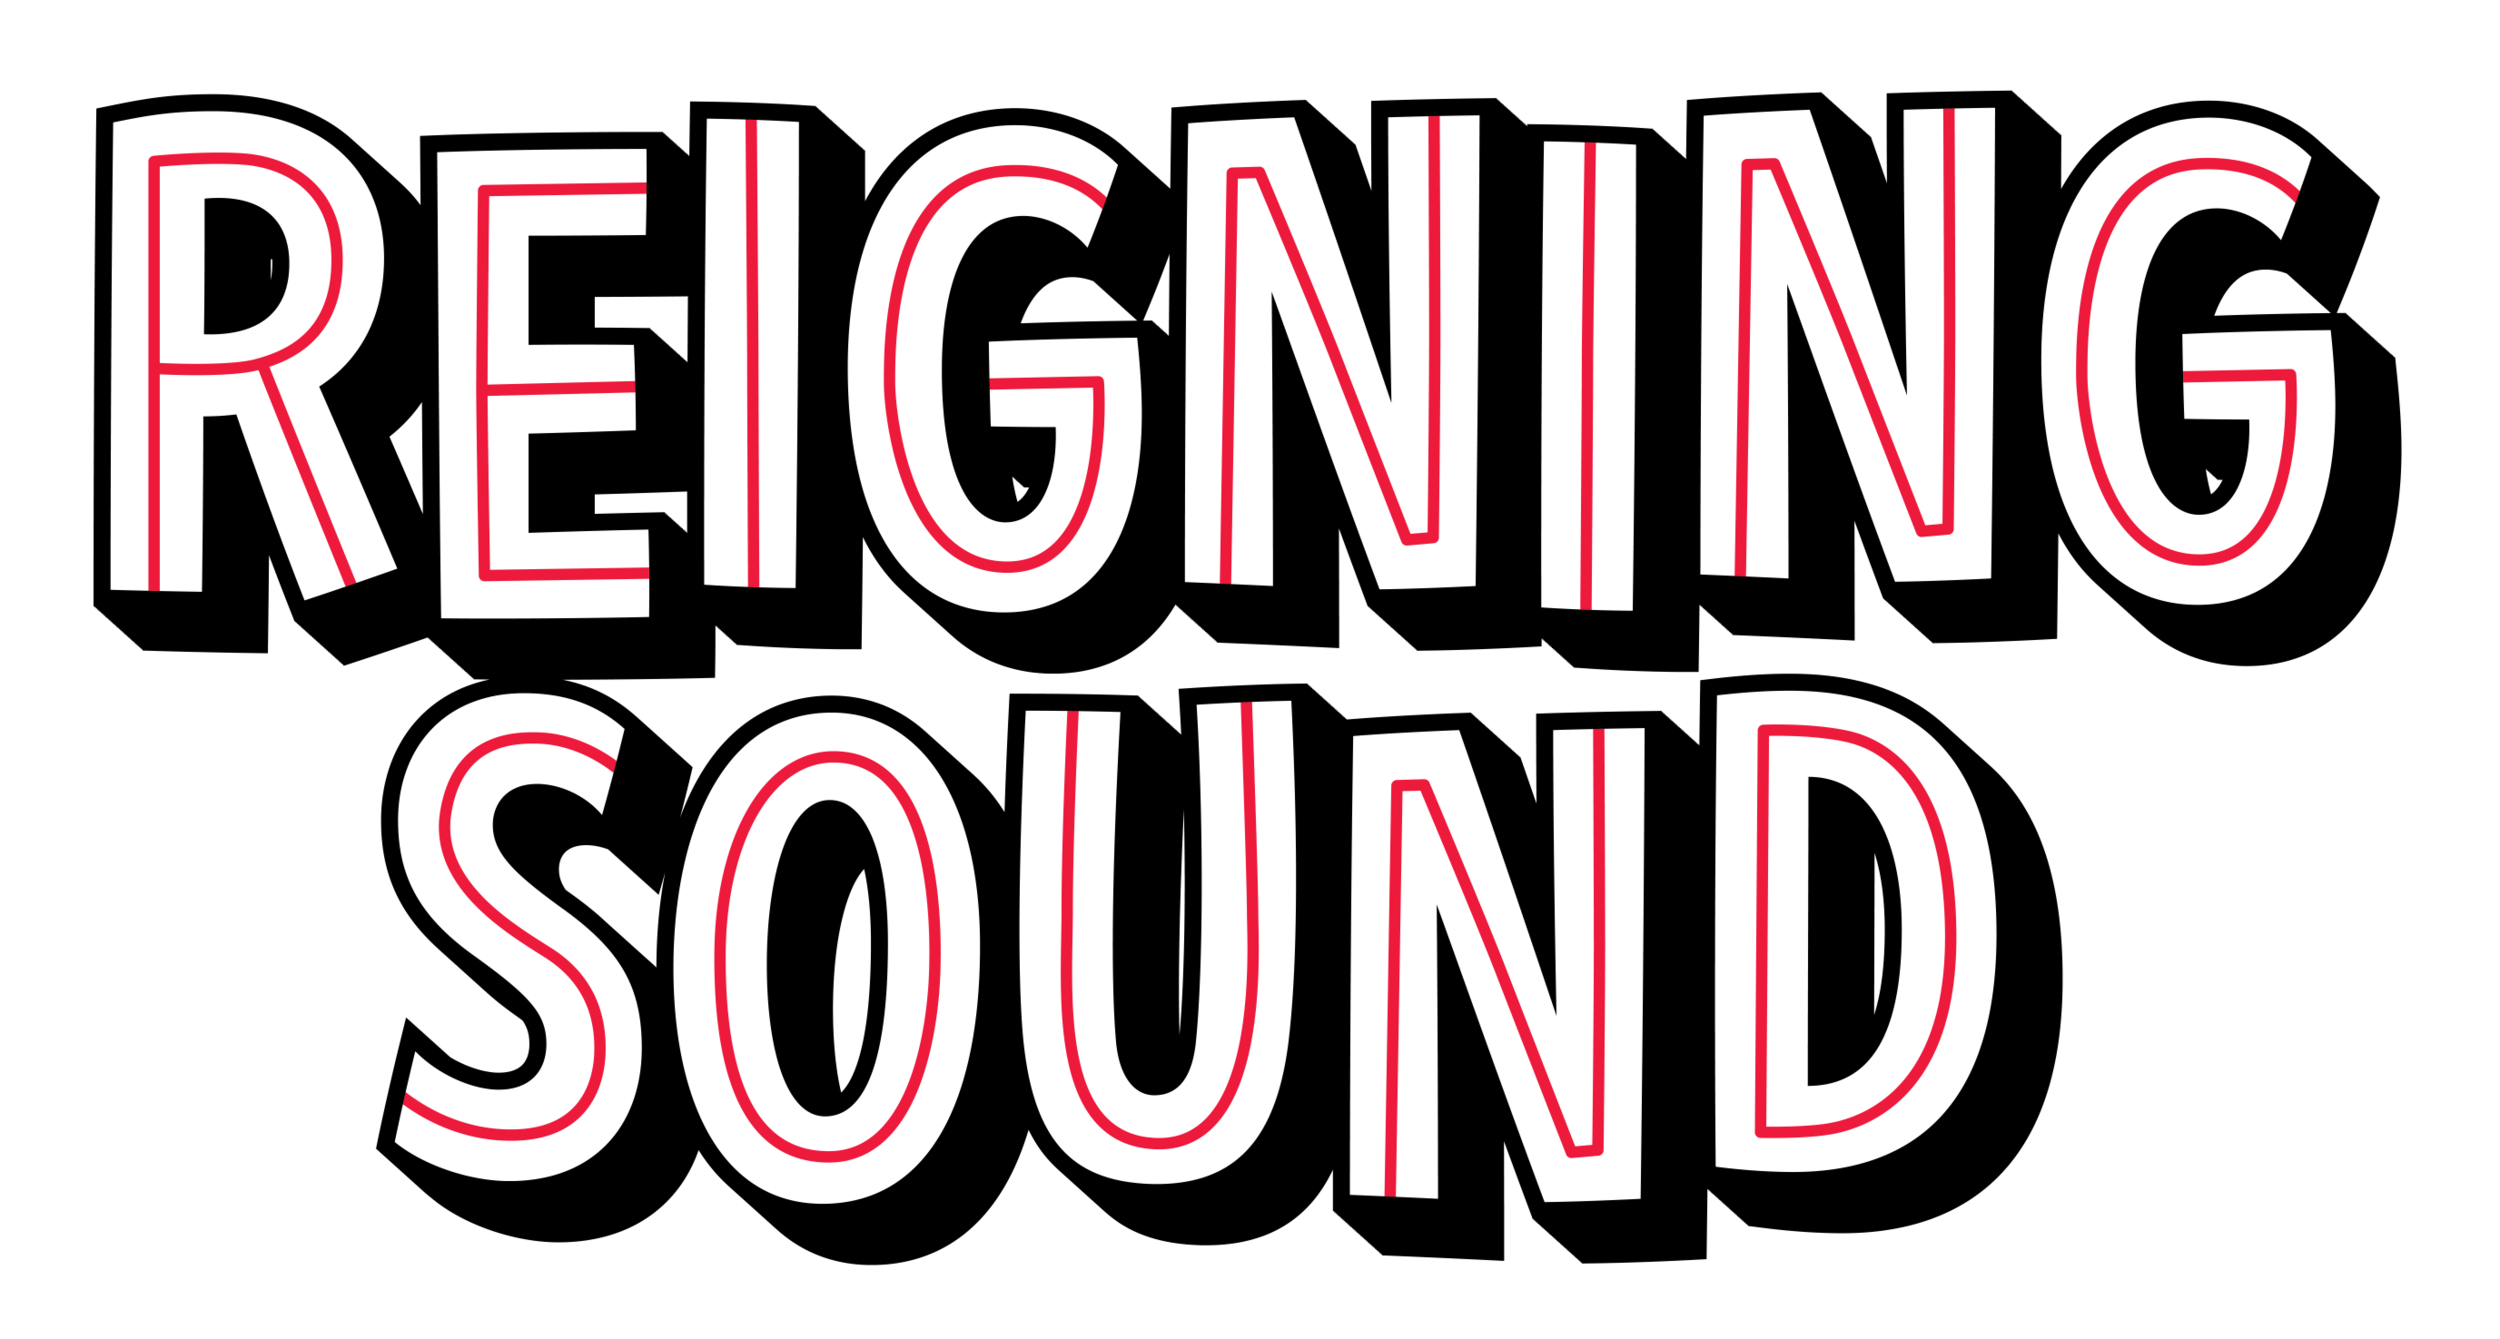 Reigning Sound logo